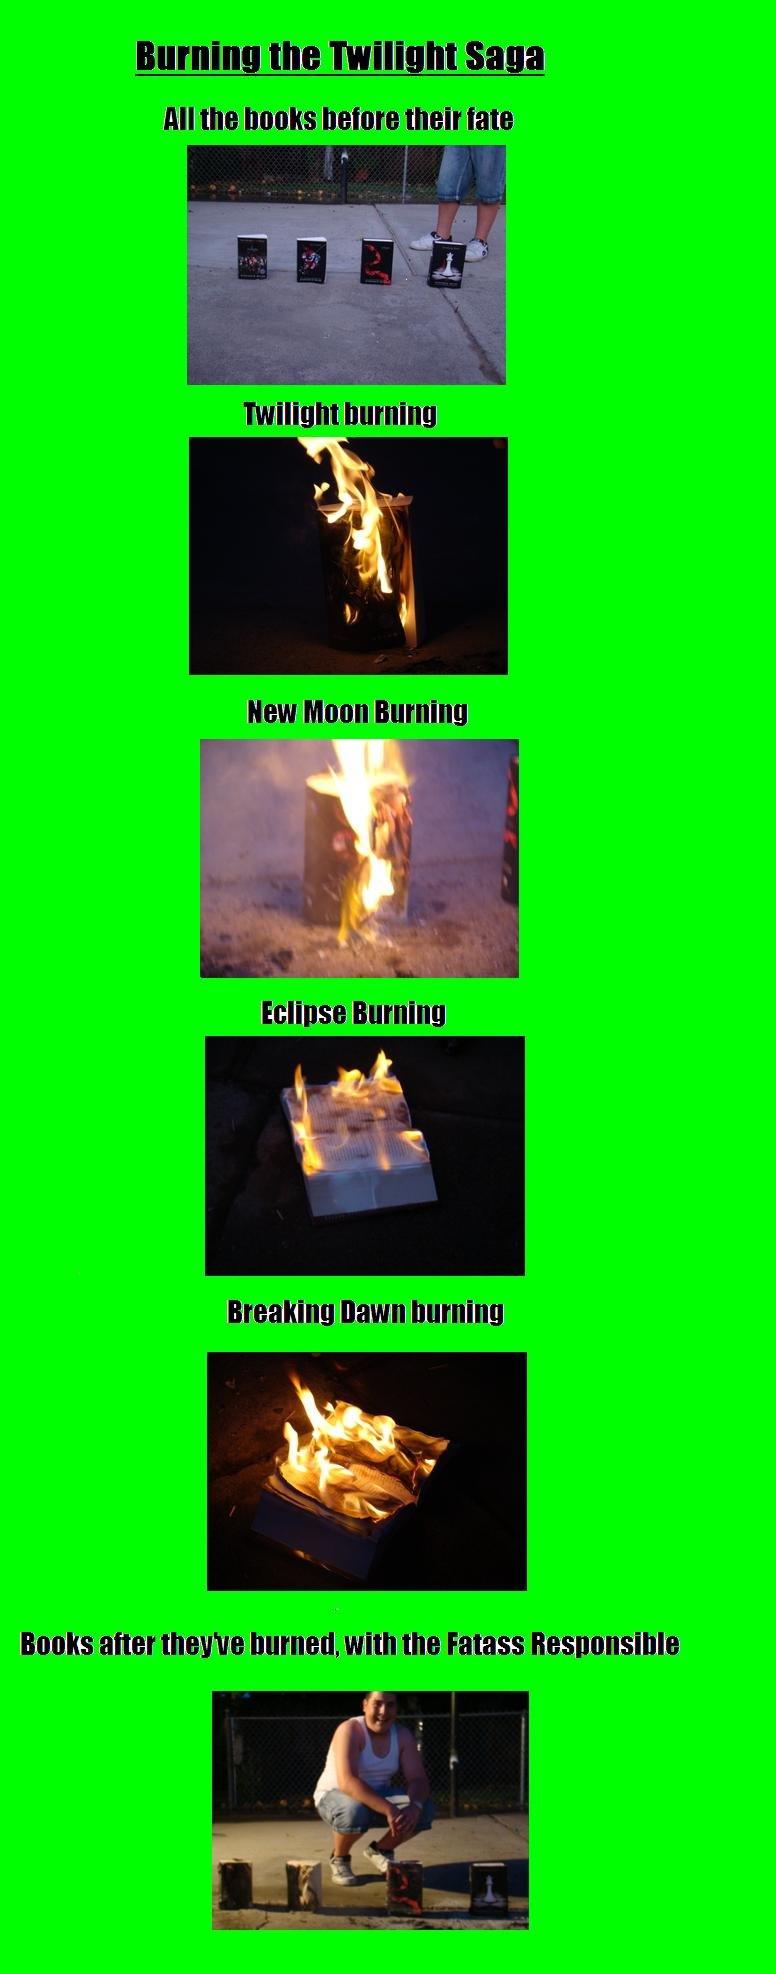 Burning Twilight!. I've seen people burn single books of Twilight, but I've never seen anyone burn the whole series. My nephew got the whole series for free fro twilight burn fire Evil edward bella jacob saga free